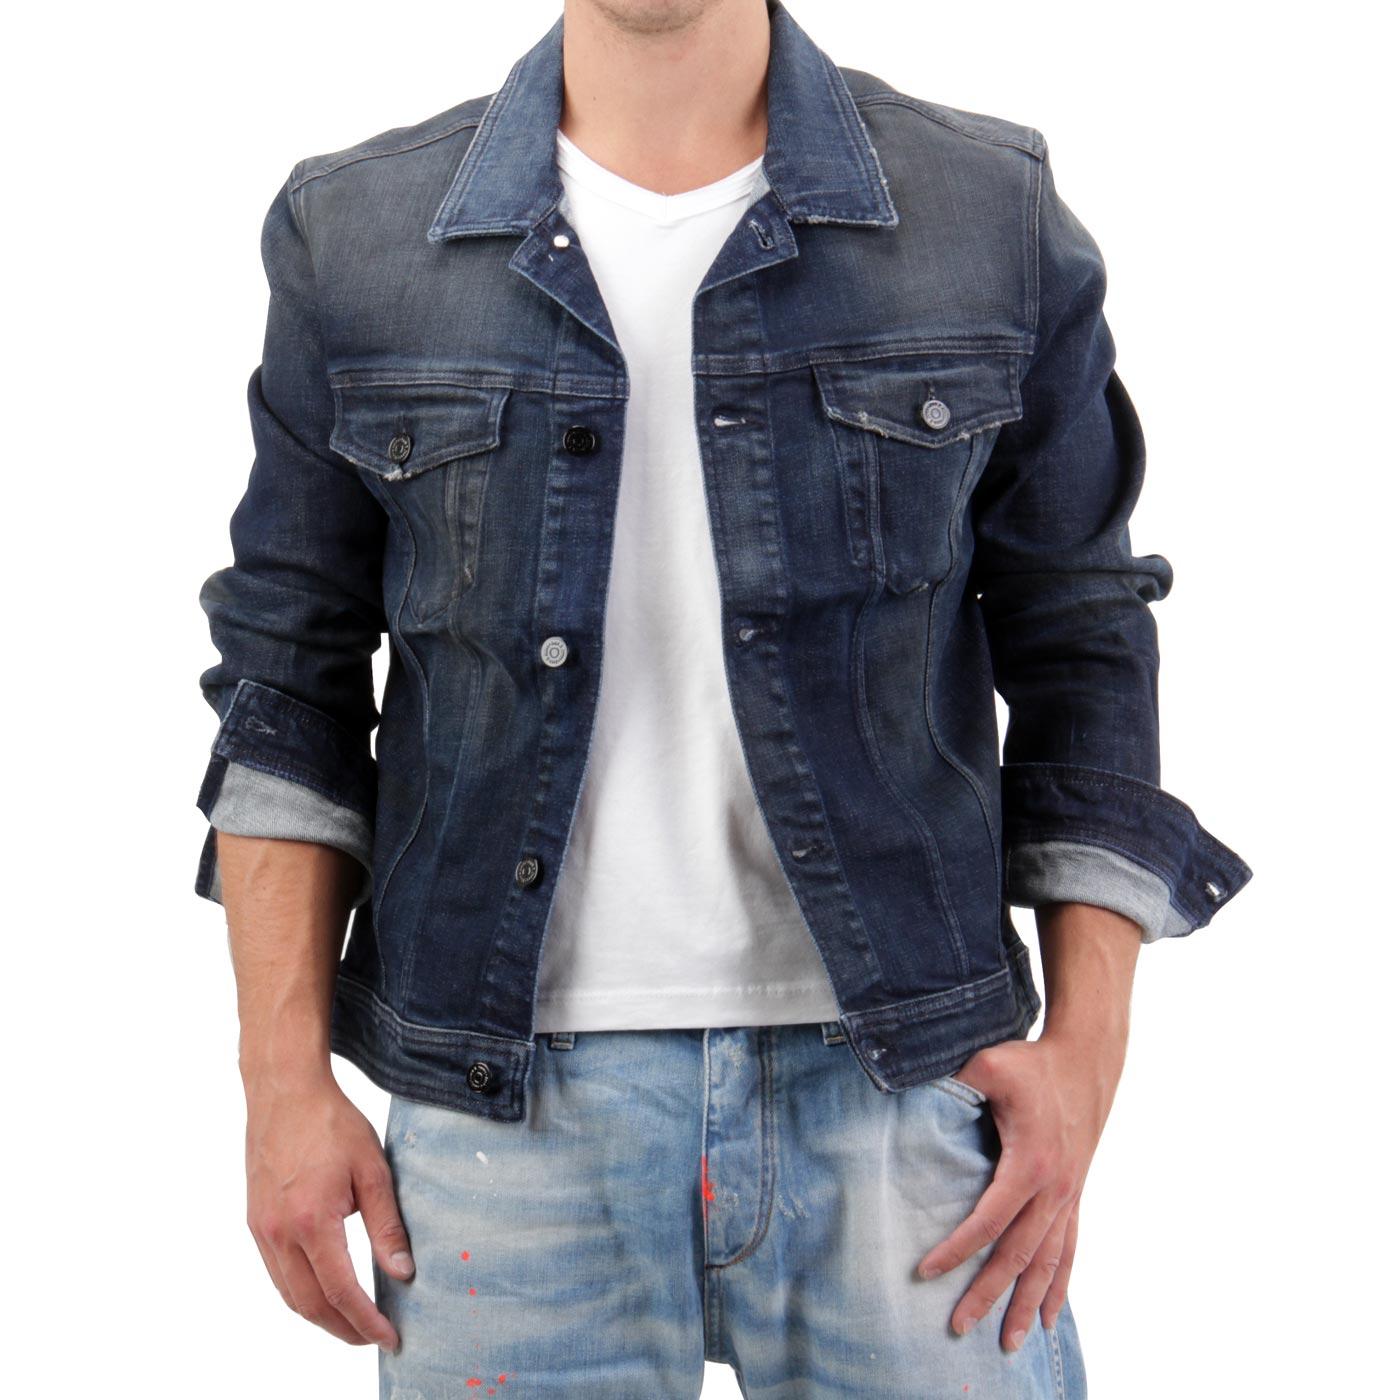 jack jones herren jeans jacke jeansjacke jean comfort. Black Bedroom Furniture Sets. Home Design Ideas